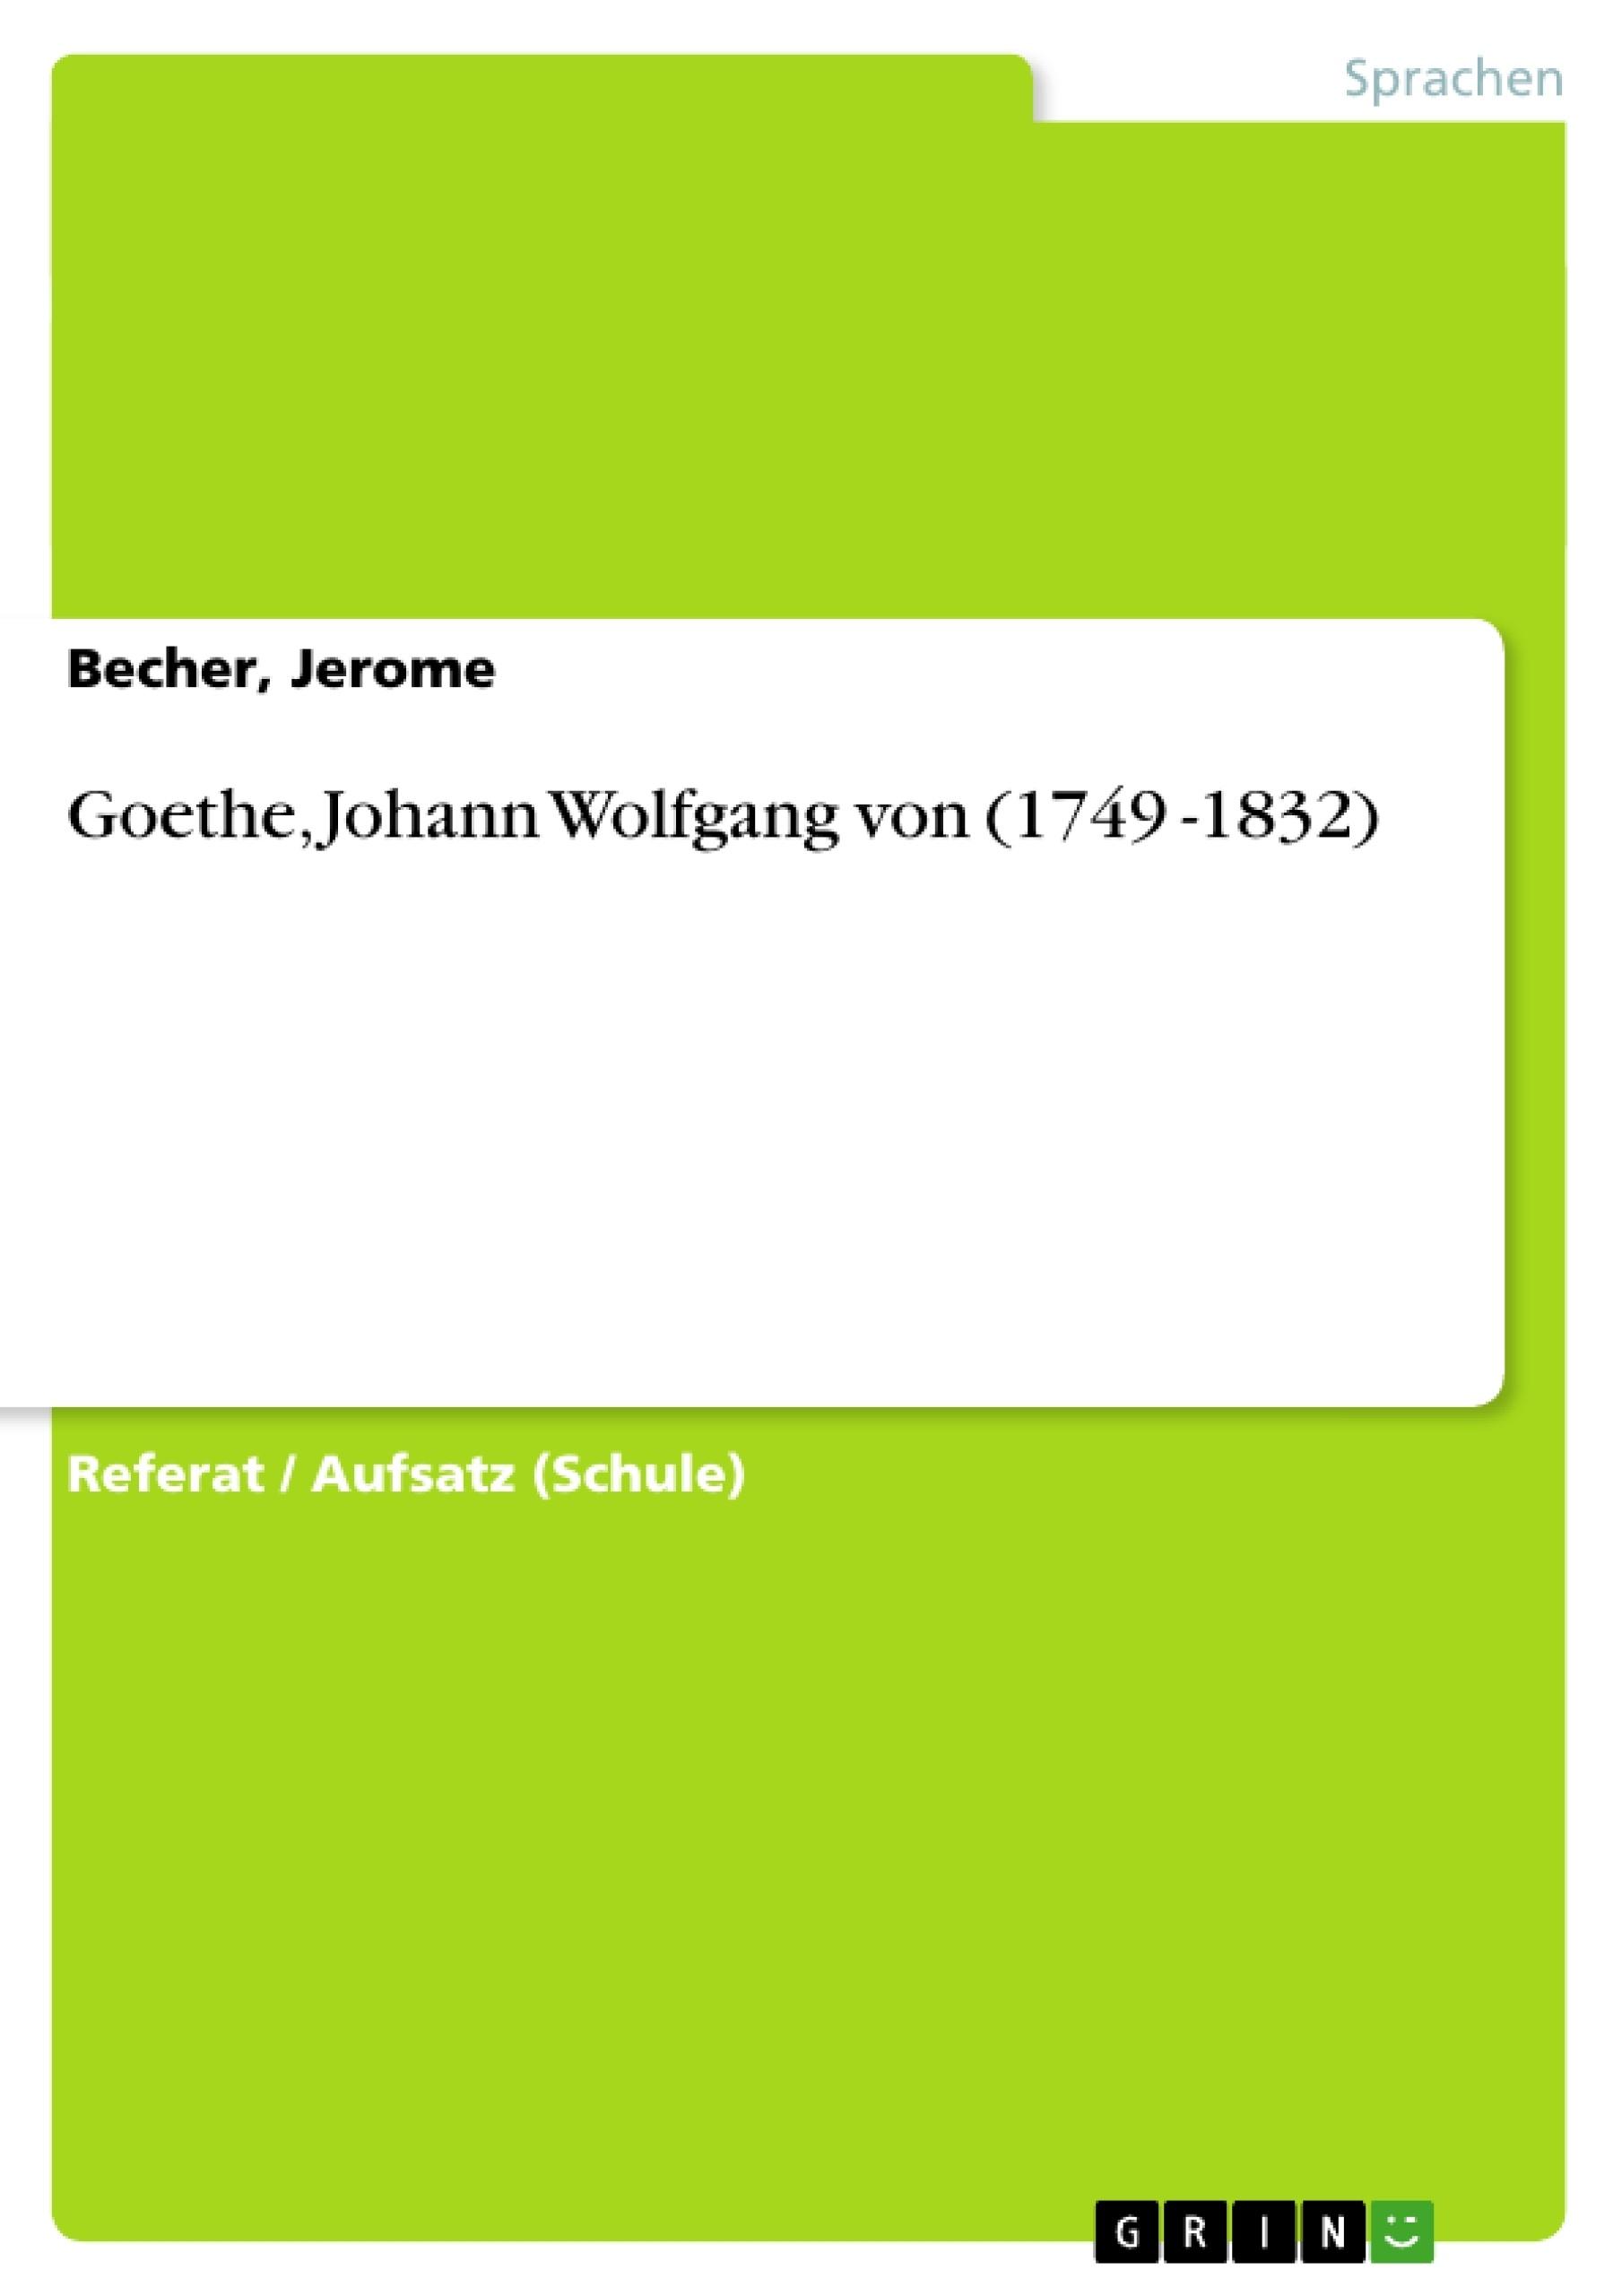 Titel: Goethe, Johann Wolfgang von (1749 -1832)